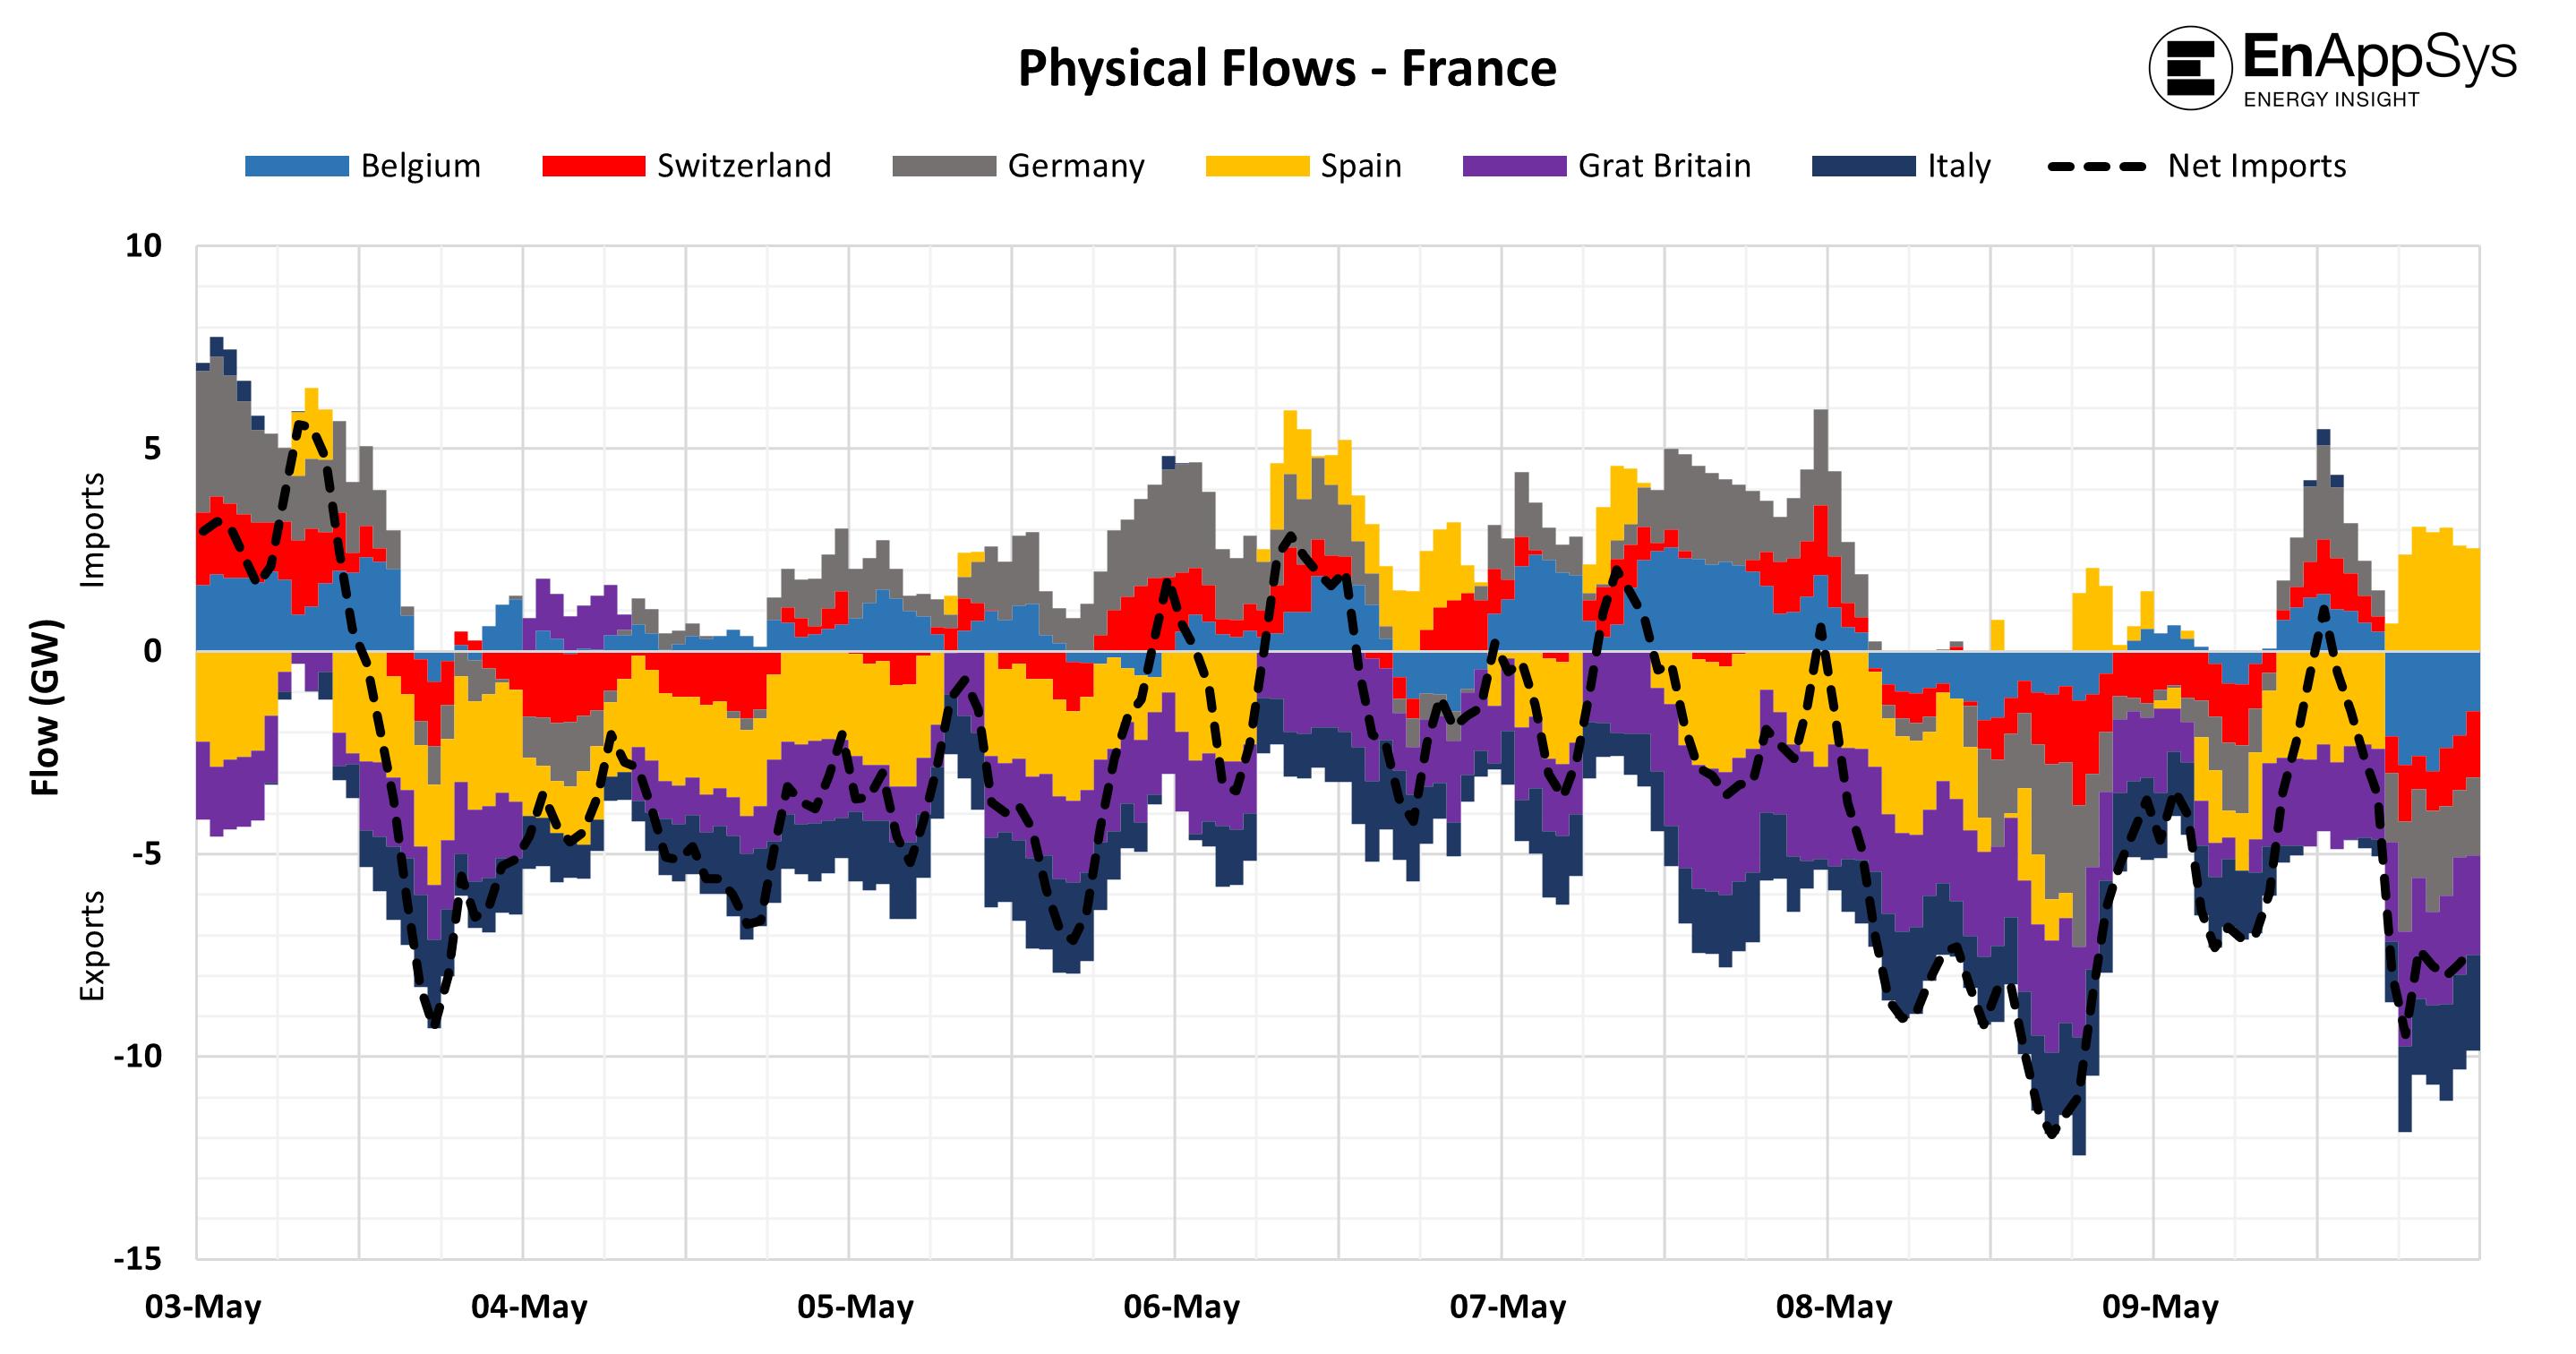 Figure 3: Physical Flows - France